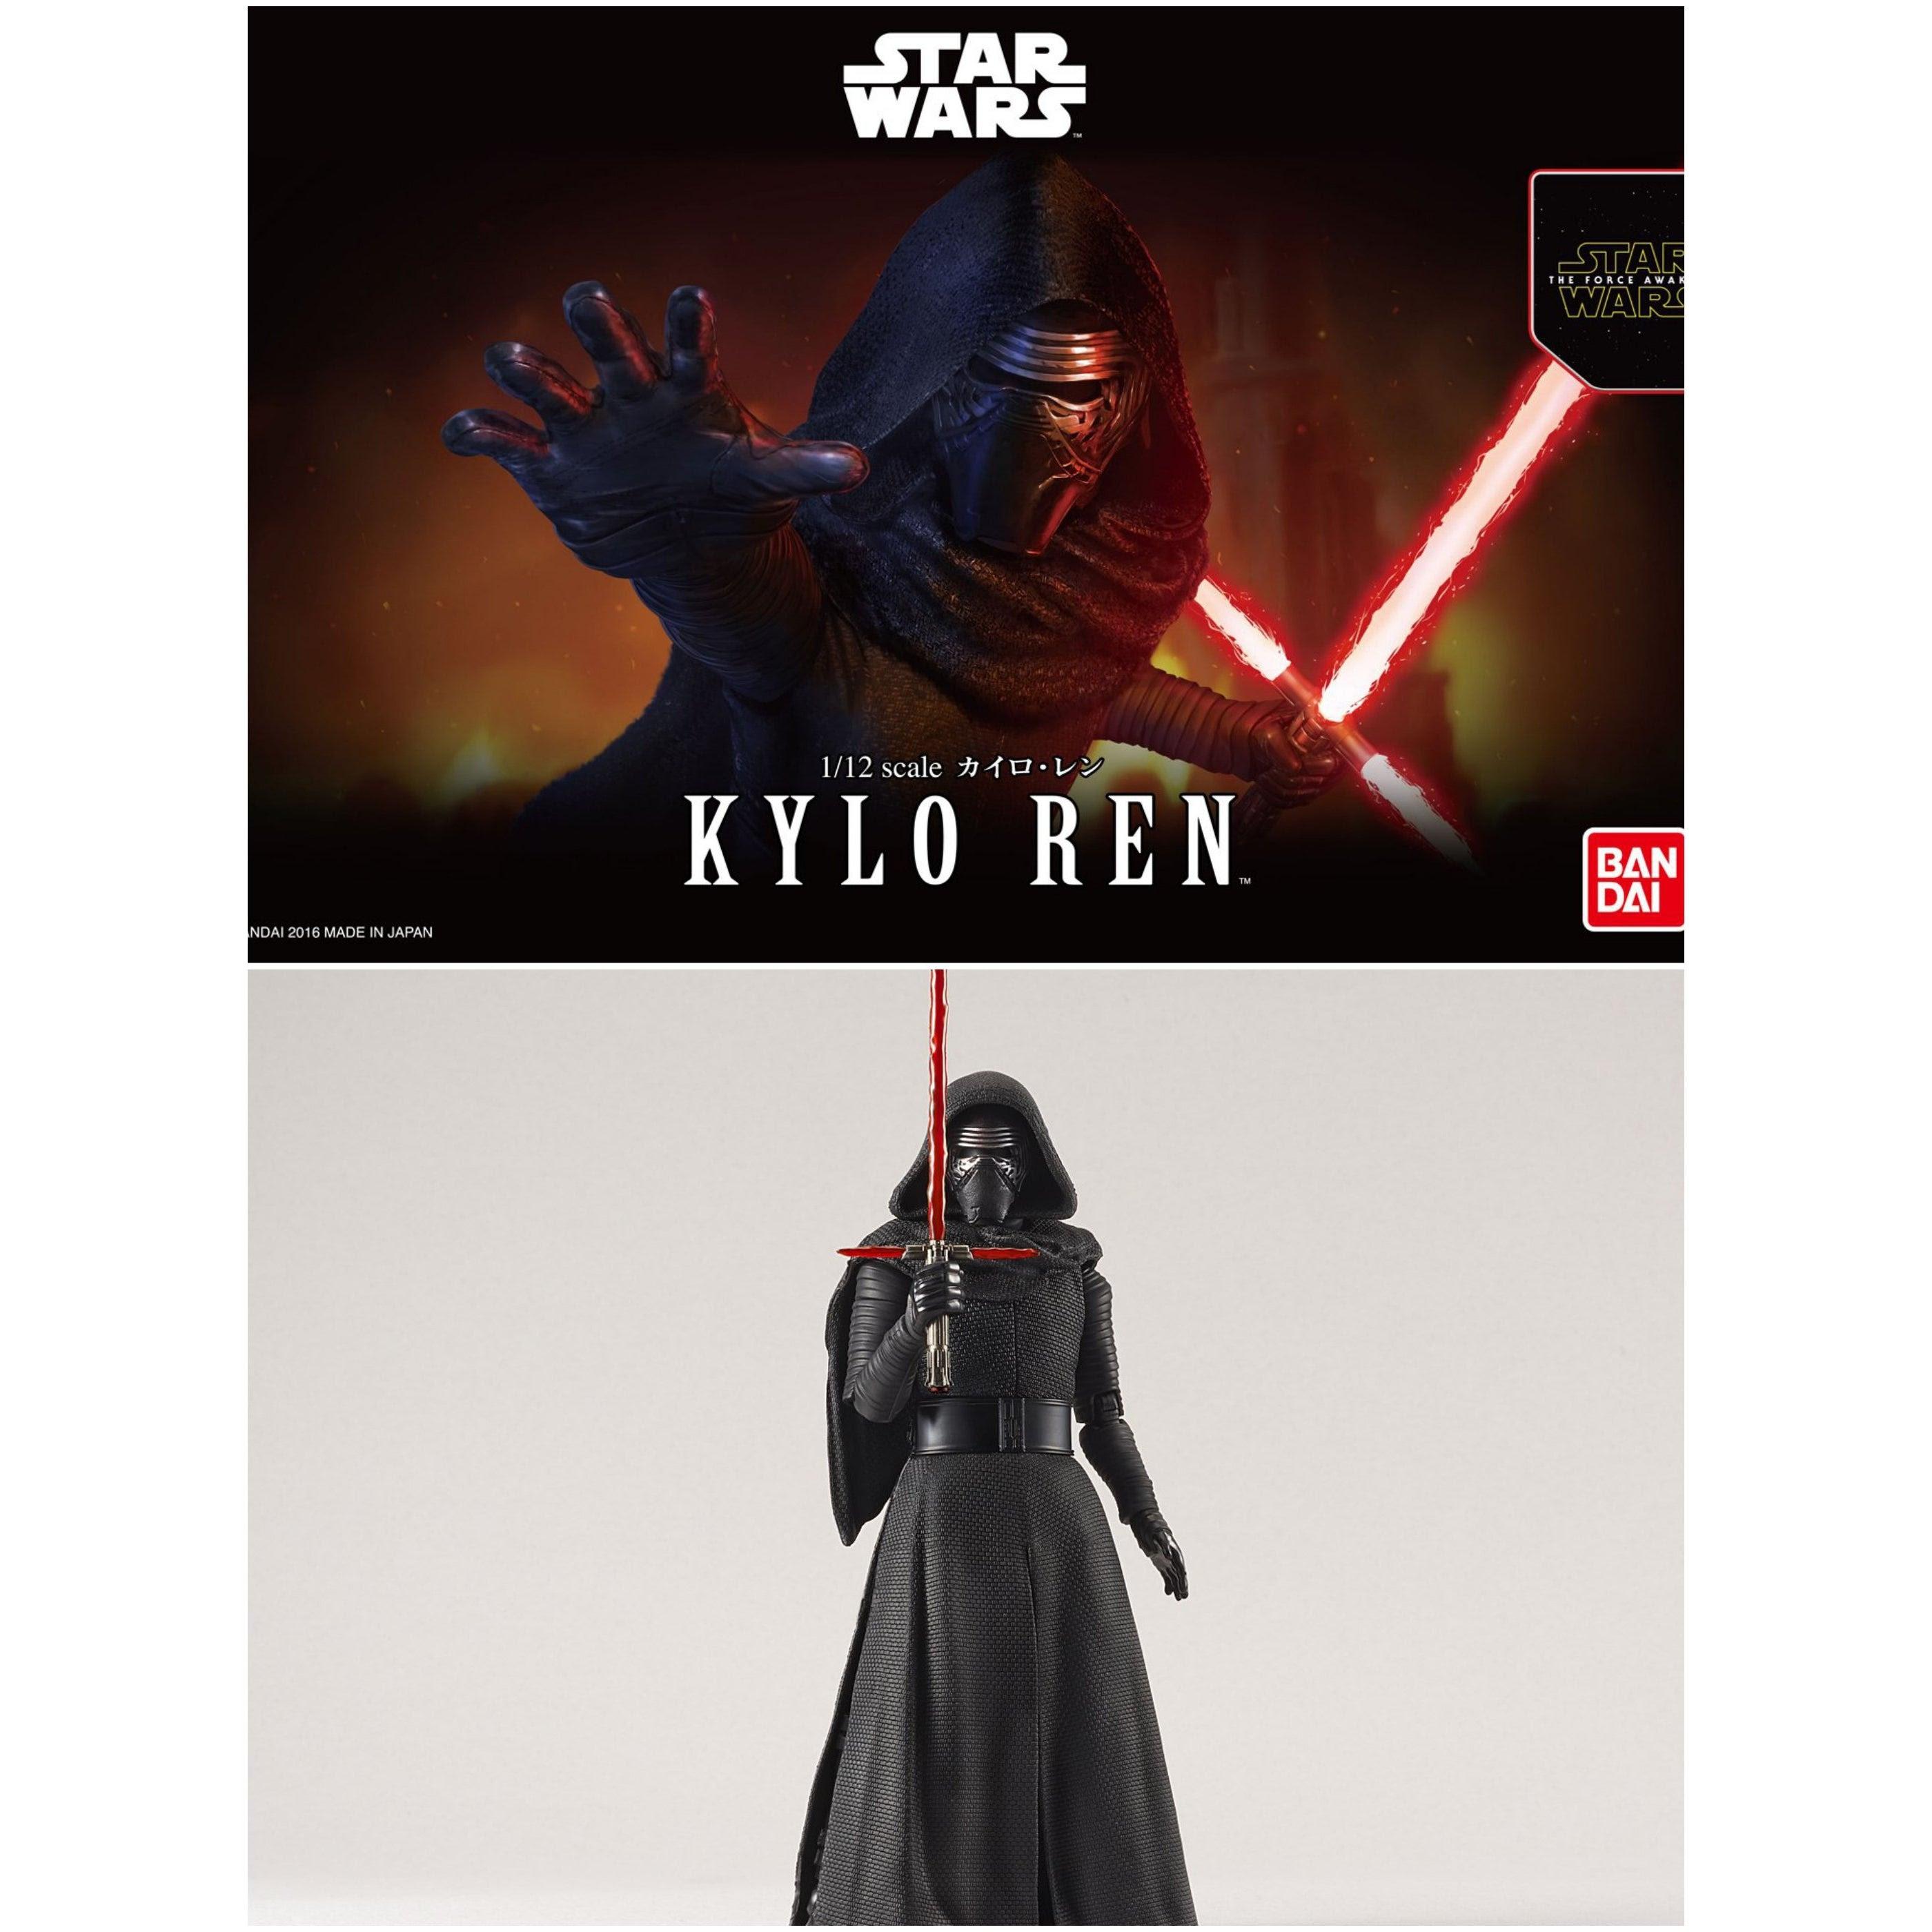 Image of Star Wars Kylo Ren 1/12 Scale Model